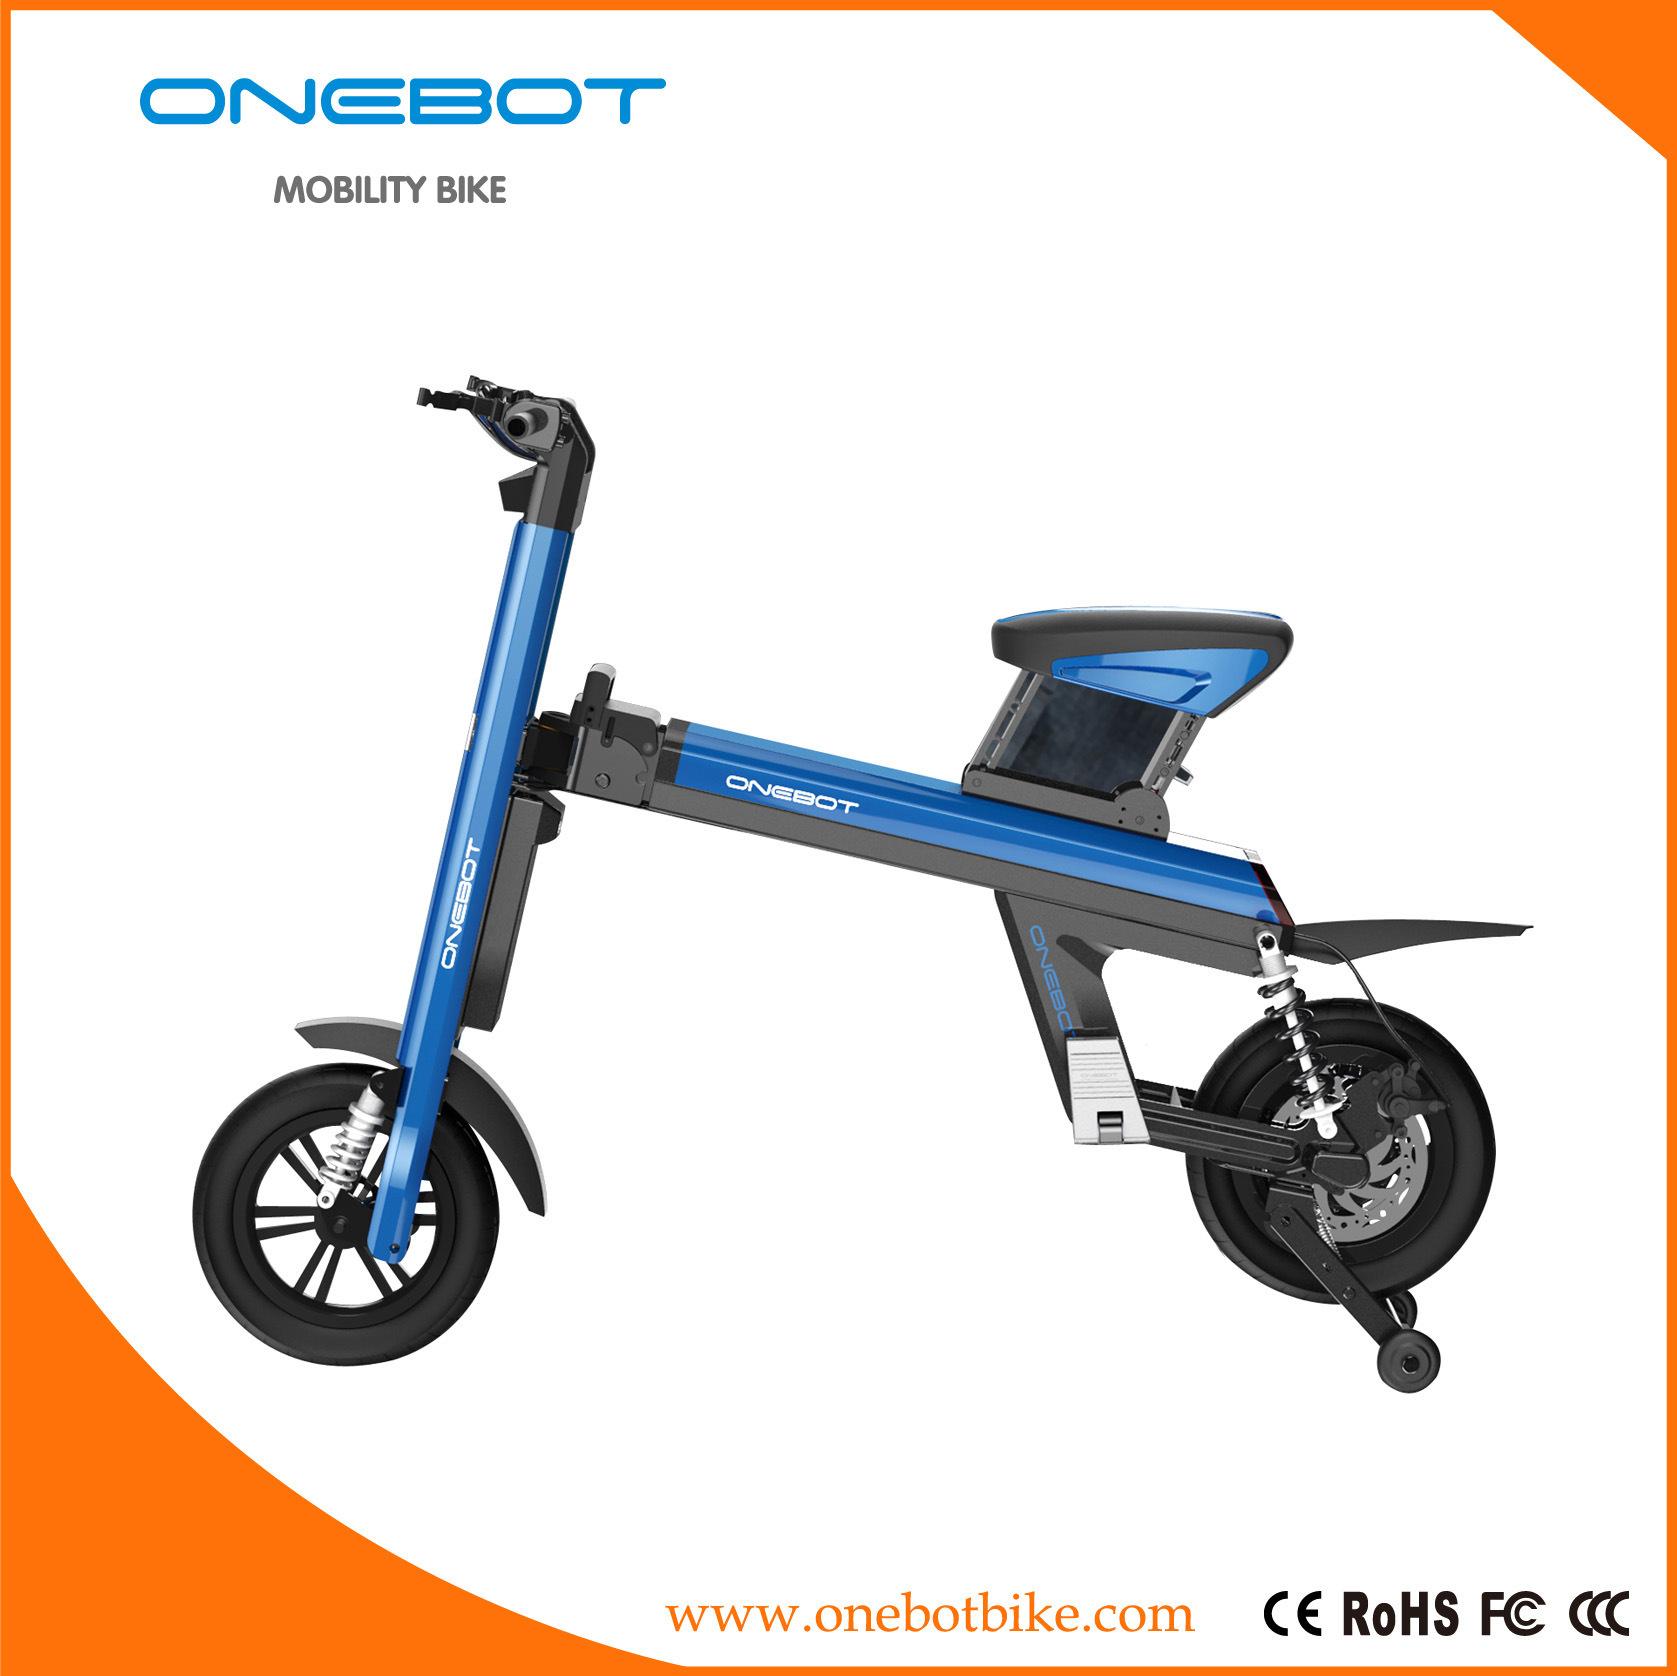 Folding Cococity 2017 Onebot E-Bike Pansonic Battery 500W Motor, Urban Mobility, Intelligent Ebike, Mini Size